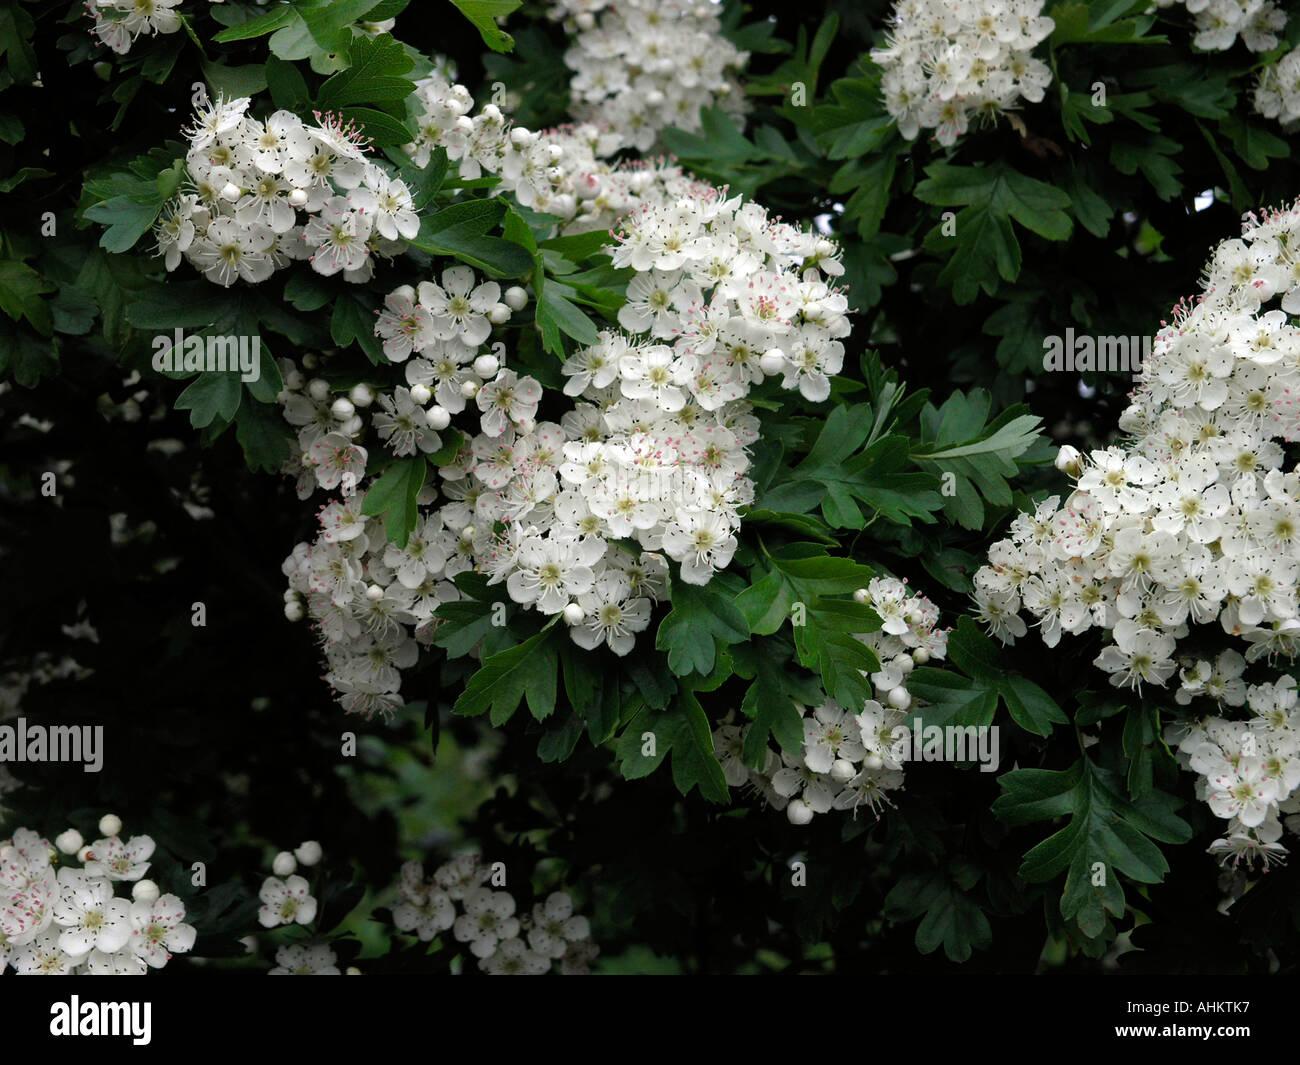 Weissdorn Blüte Stockfoto